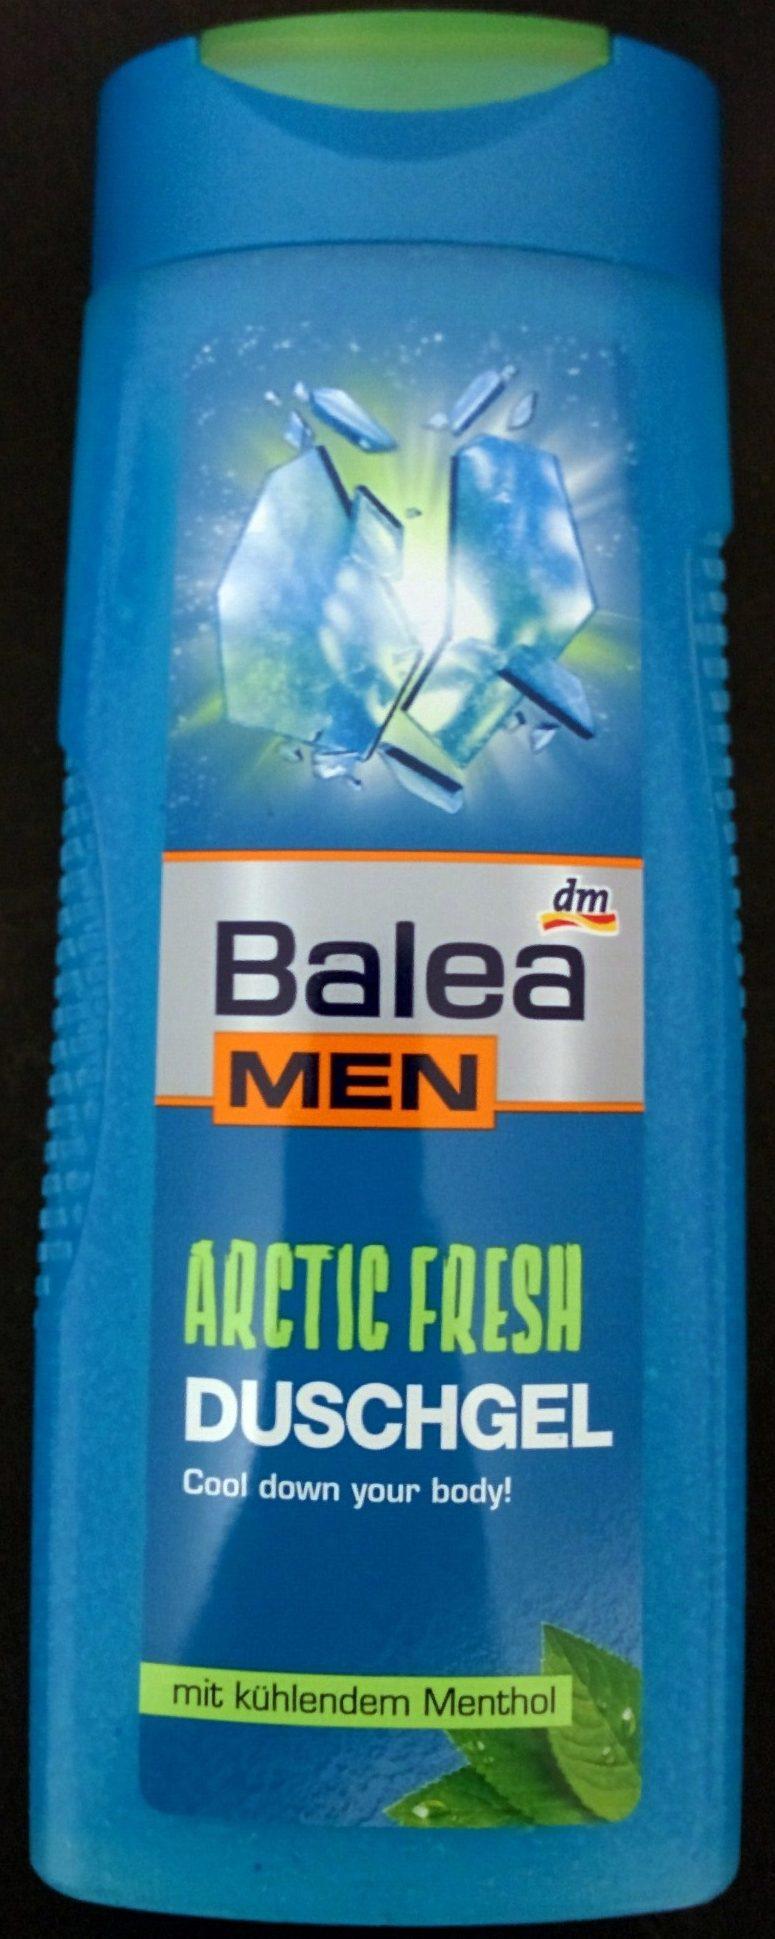 Arctic Fresh Duschgel - Product